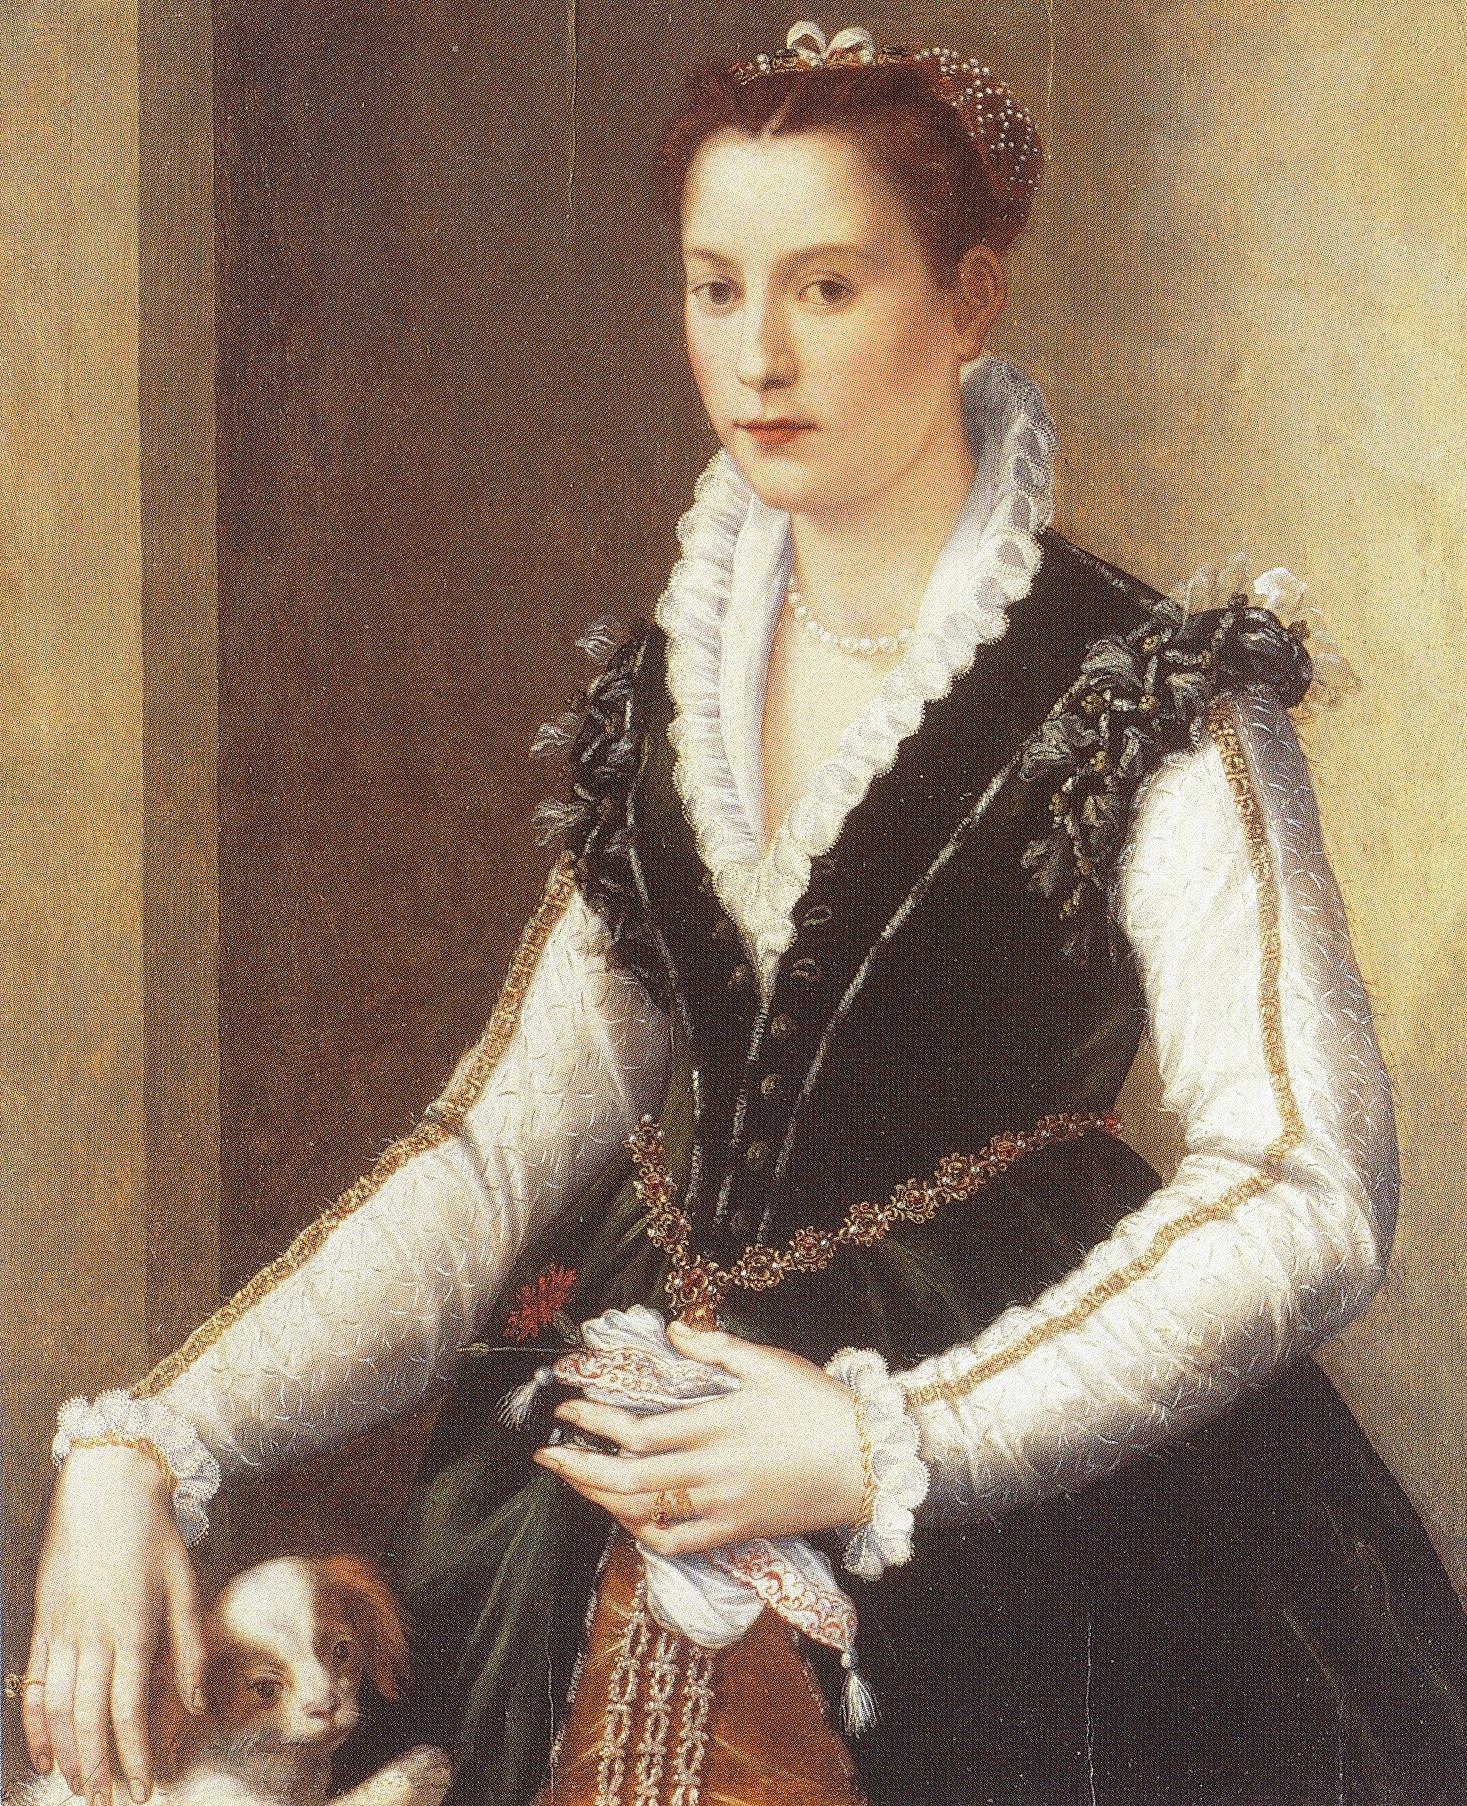 Isabella de' Medici Orsini - Born: August 31, 1542, Florence, ItalyDied: July 16, 1576, Cerreto Guidi, Italy